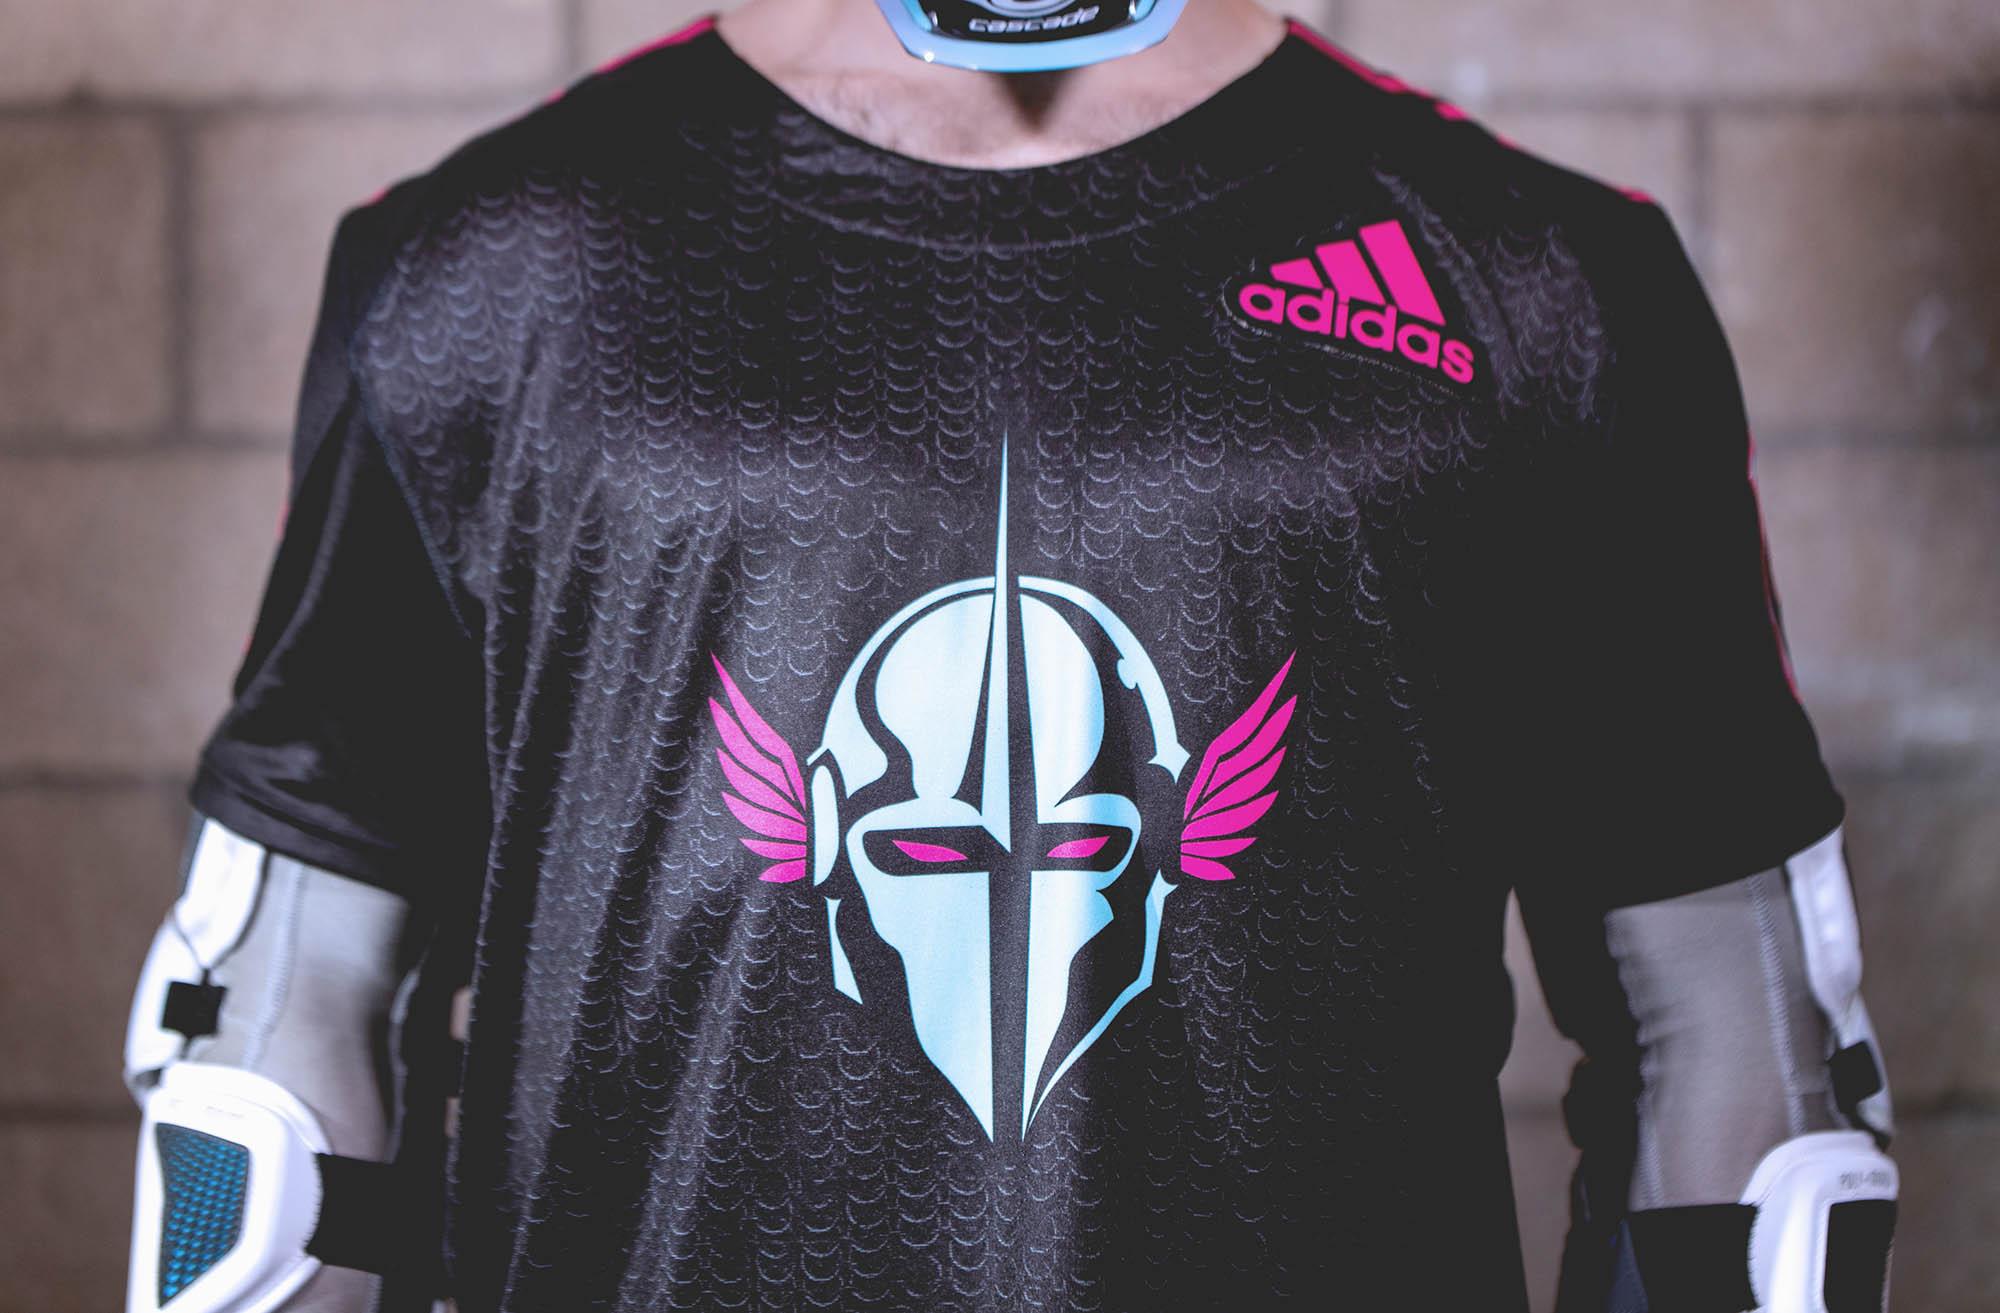 adidasLacrosse_PLL_CHROME_Crest_Home_01.jpg